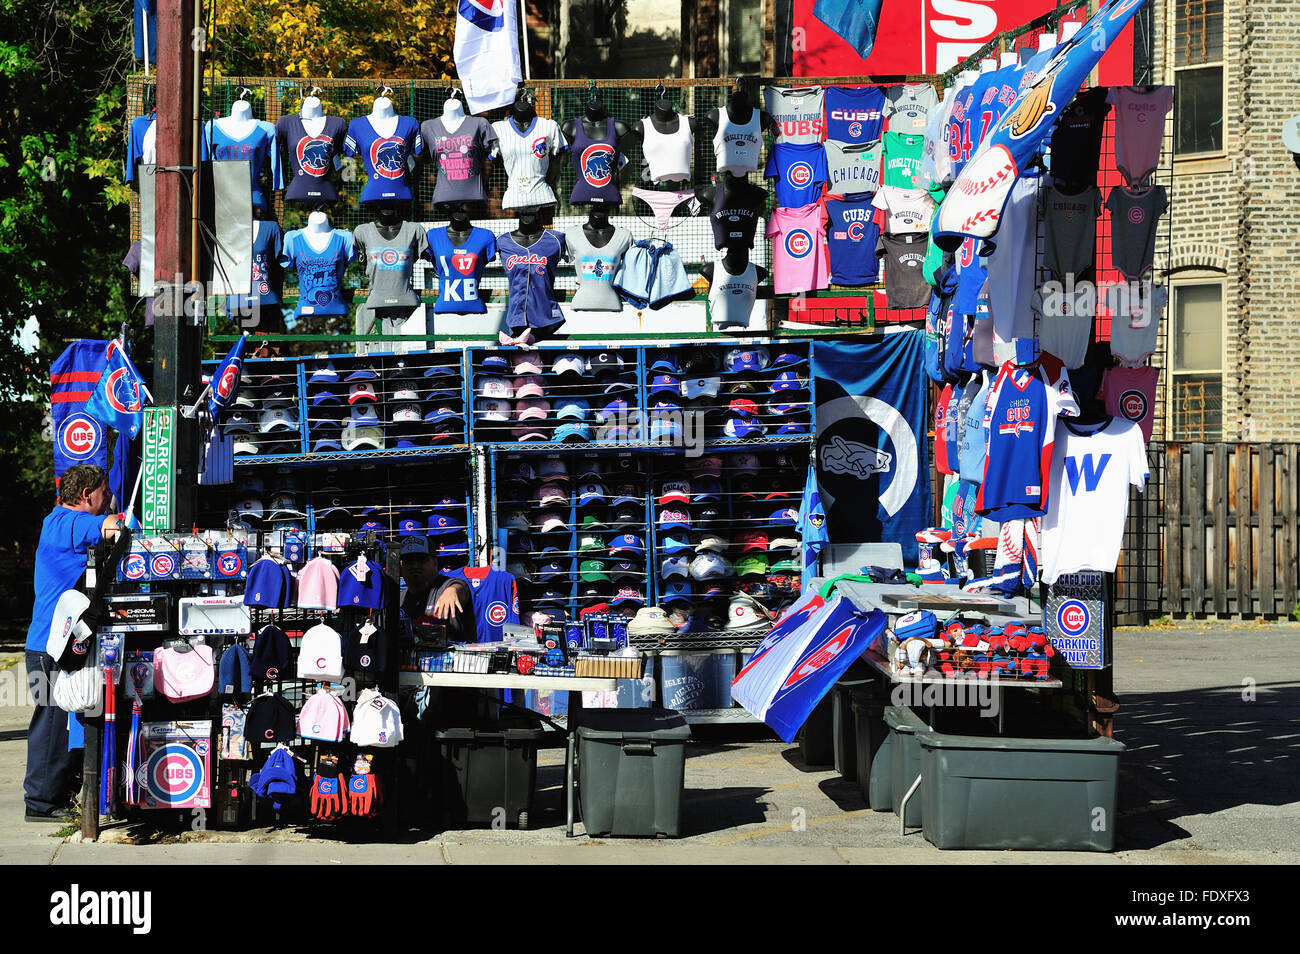 chicago cubs merchandise